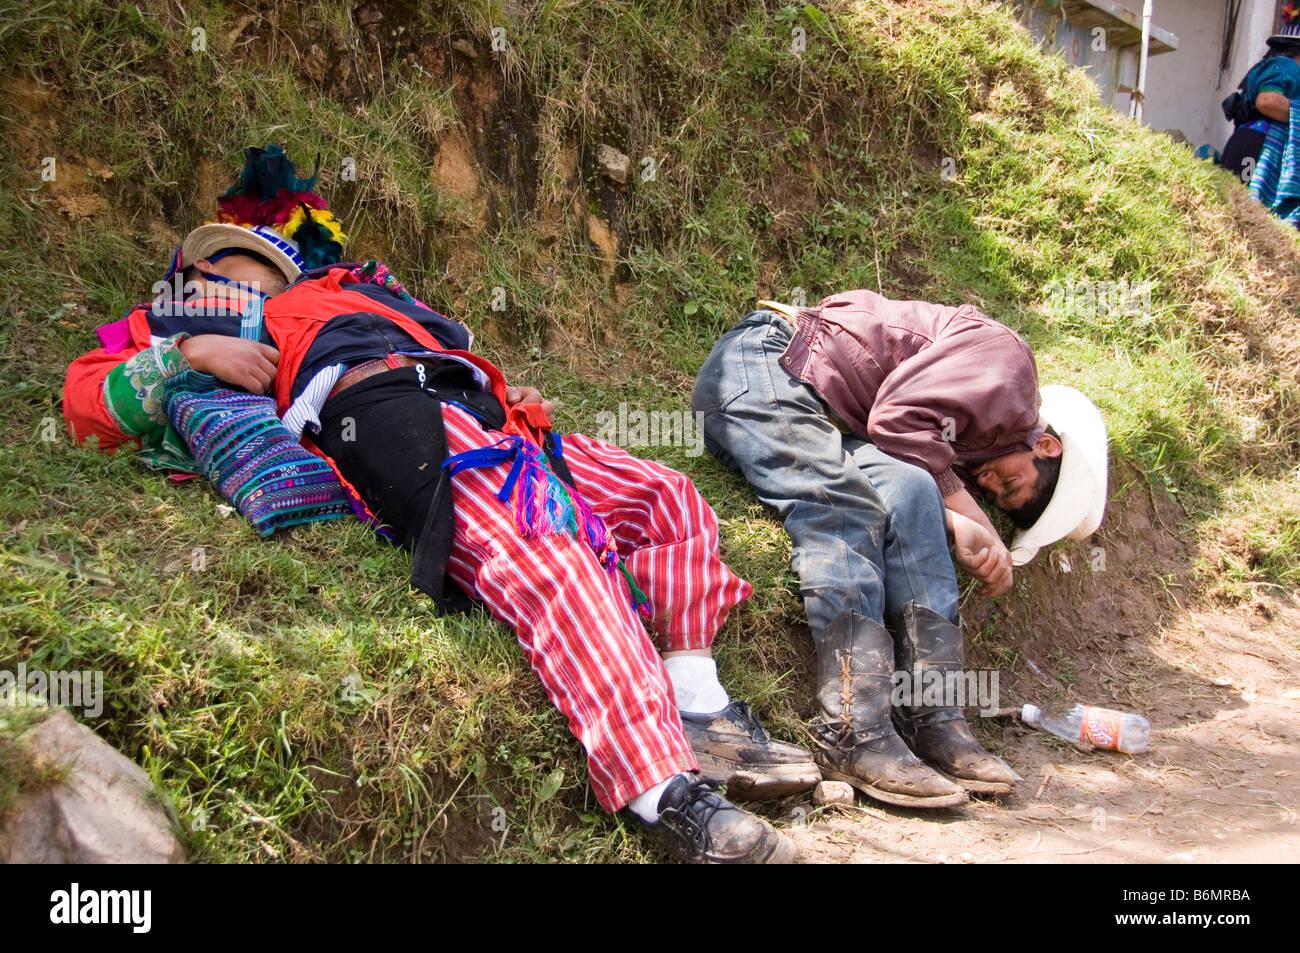 Two drunken men sleeping beside the road during the annual festival (Oct 31-Nov 2) .Todos Santos Cuchumatan,Guatemala - Stock Image